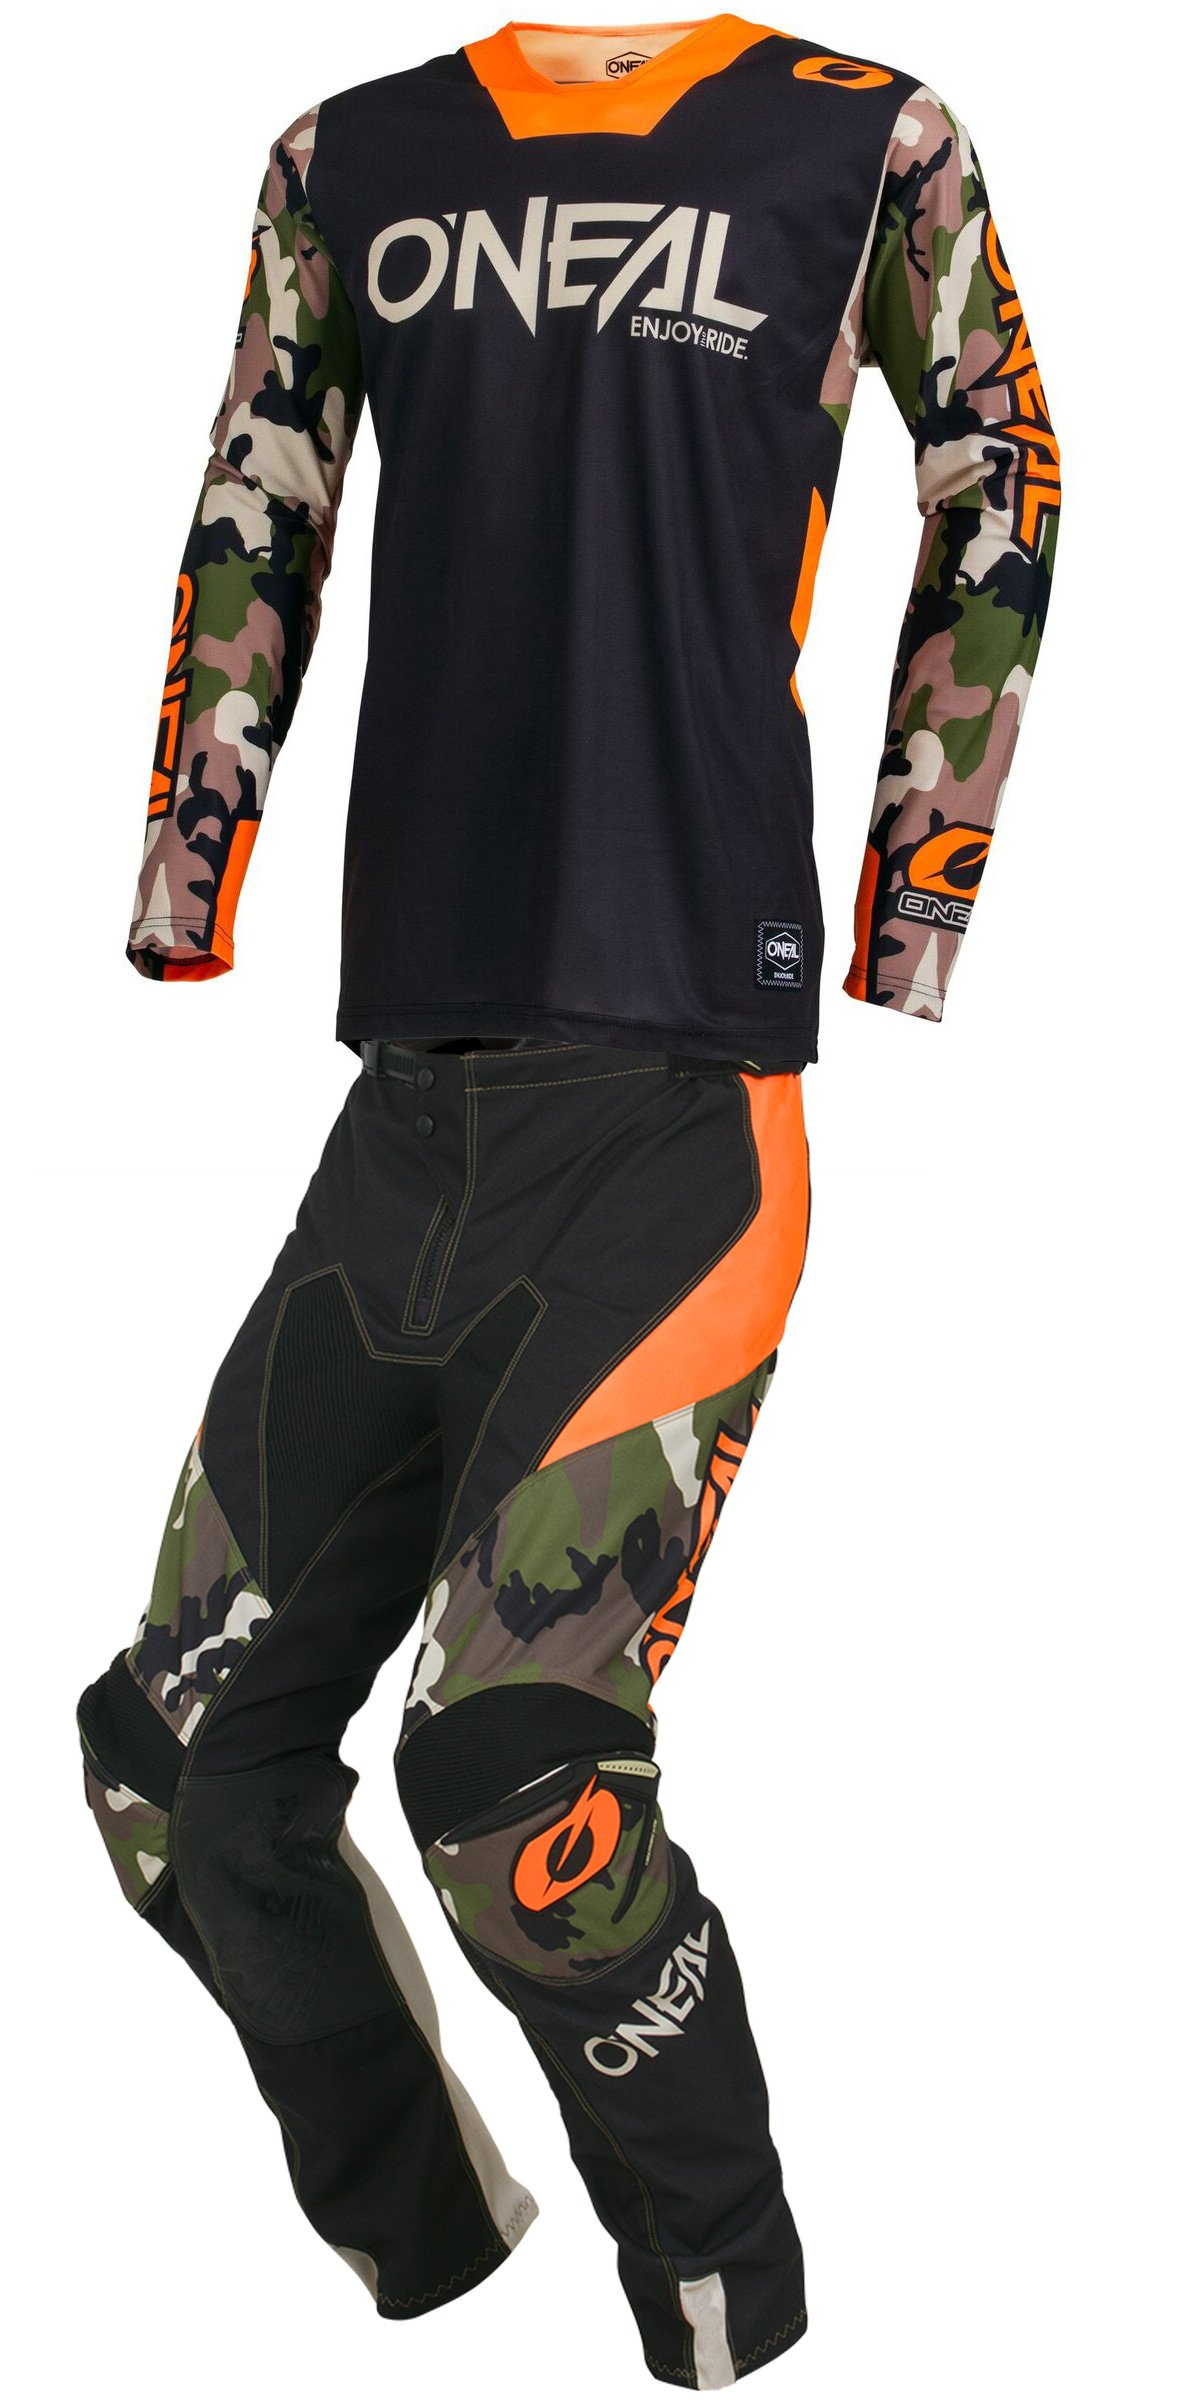 O'Neal - 2019 Mayhem Ambush (Mens HI-VIS Orange & Black X-Large/34W) MX Riding Gear Combo Set, Motocross Off-Road Dirt Bike Camo Jersey & Lite Pant